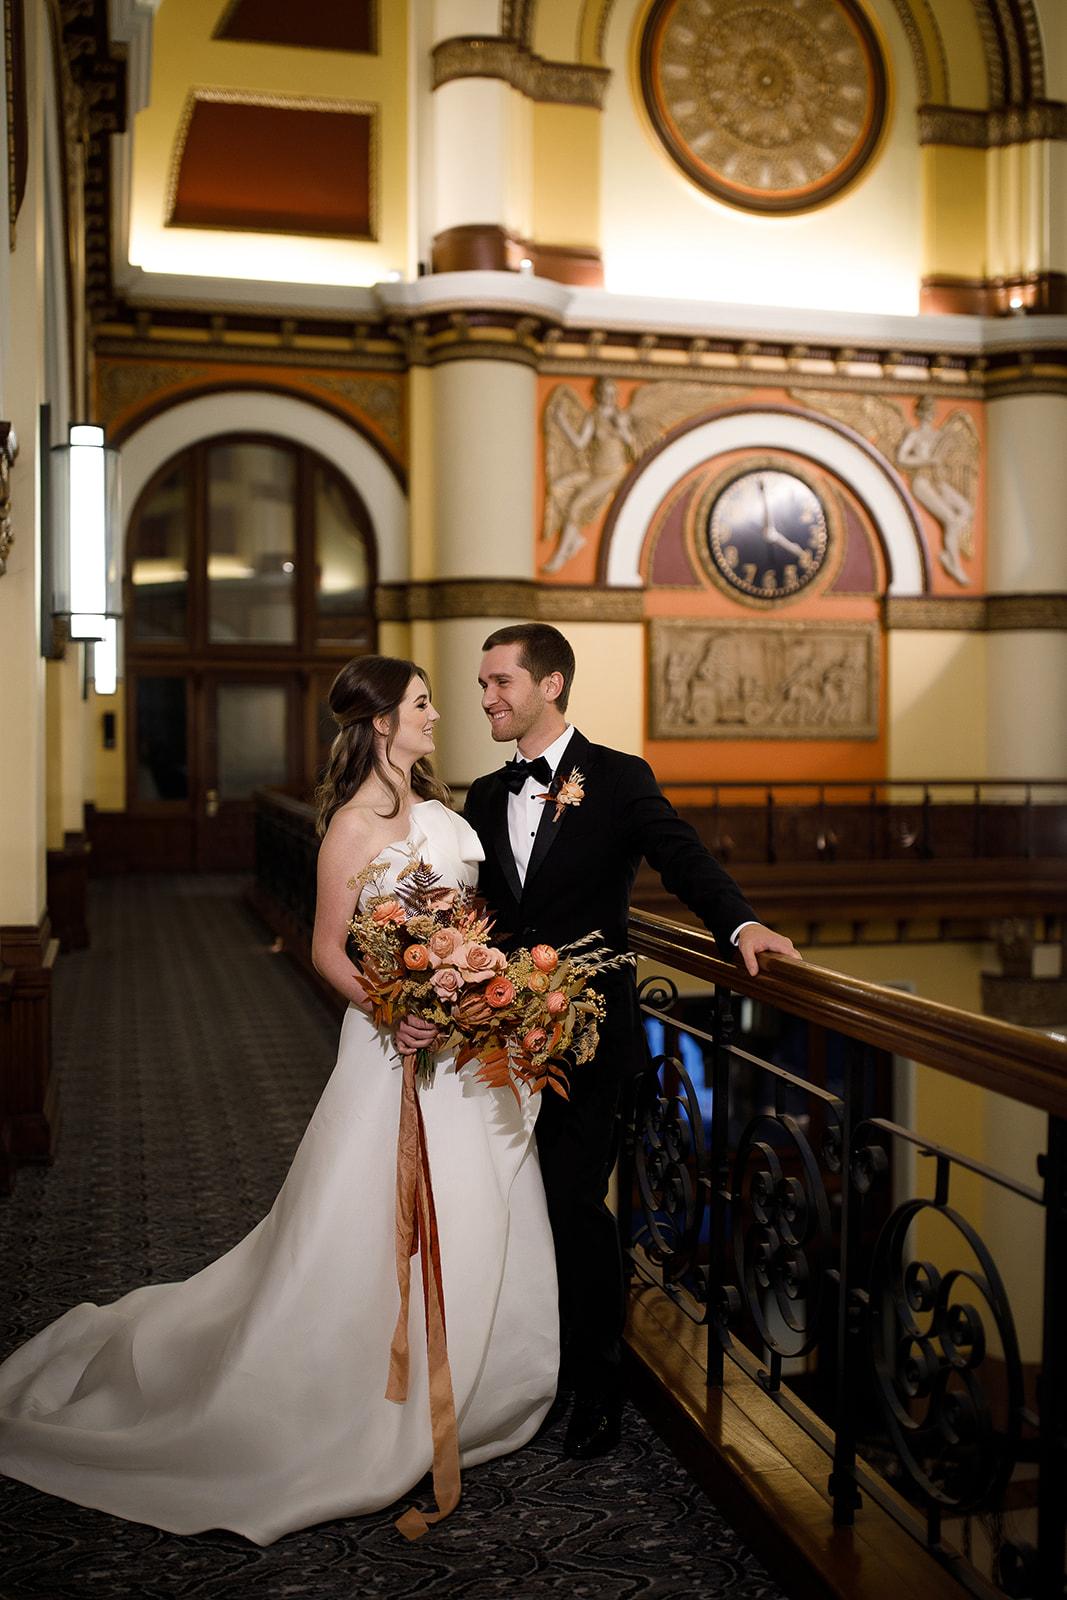 Courtney Davidson Wedding Photography featured on Nashville Bride Guide